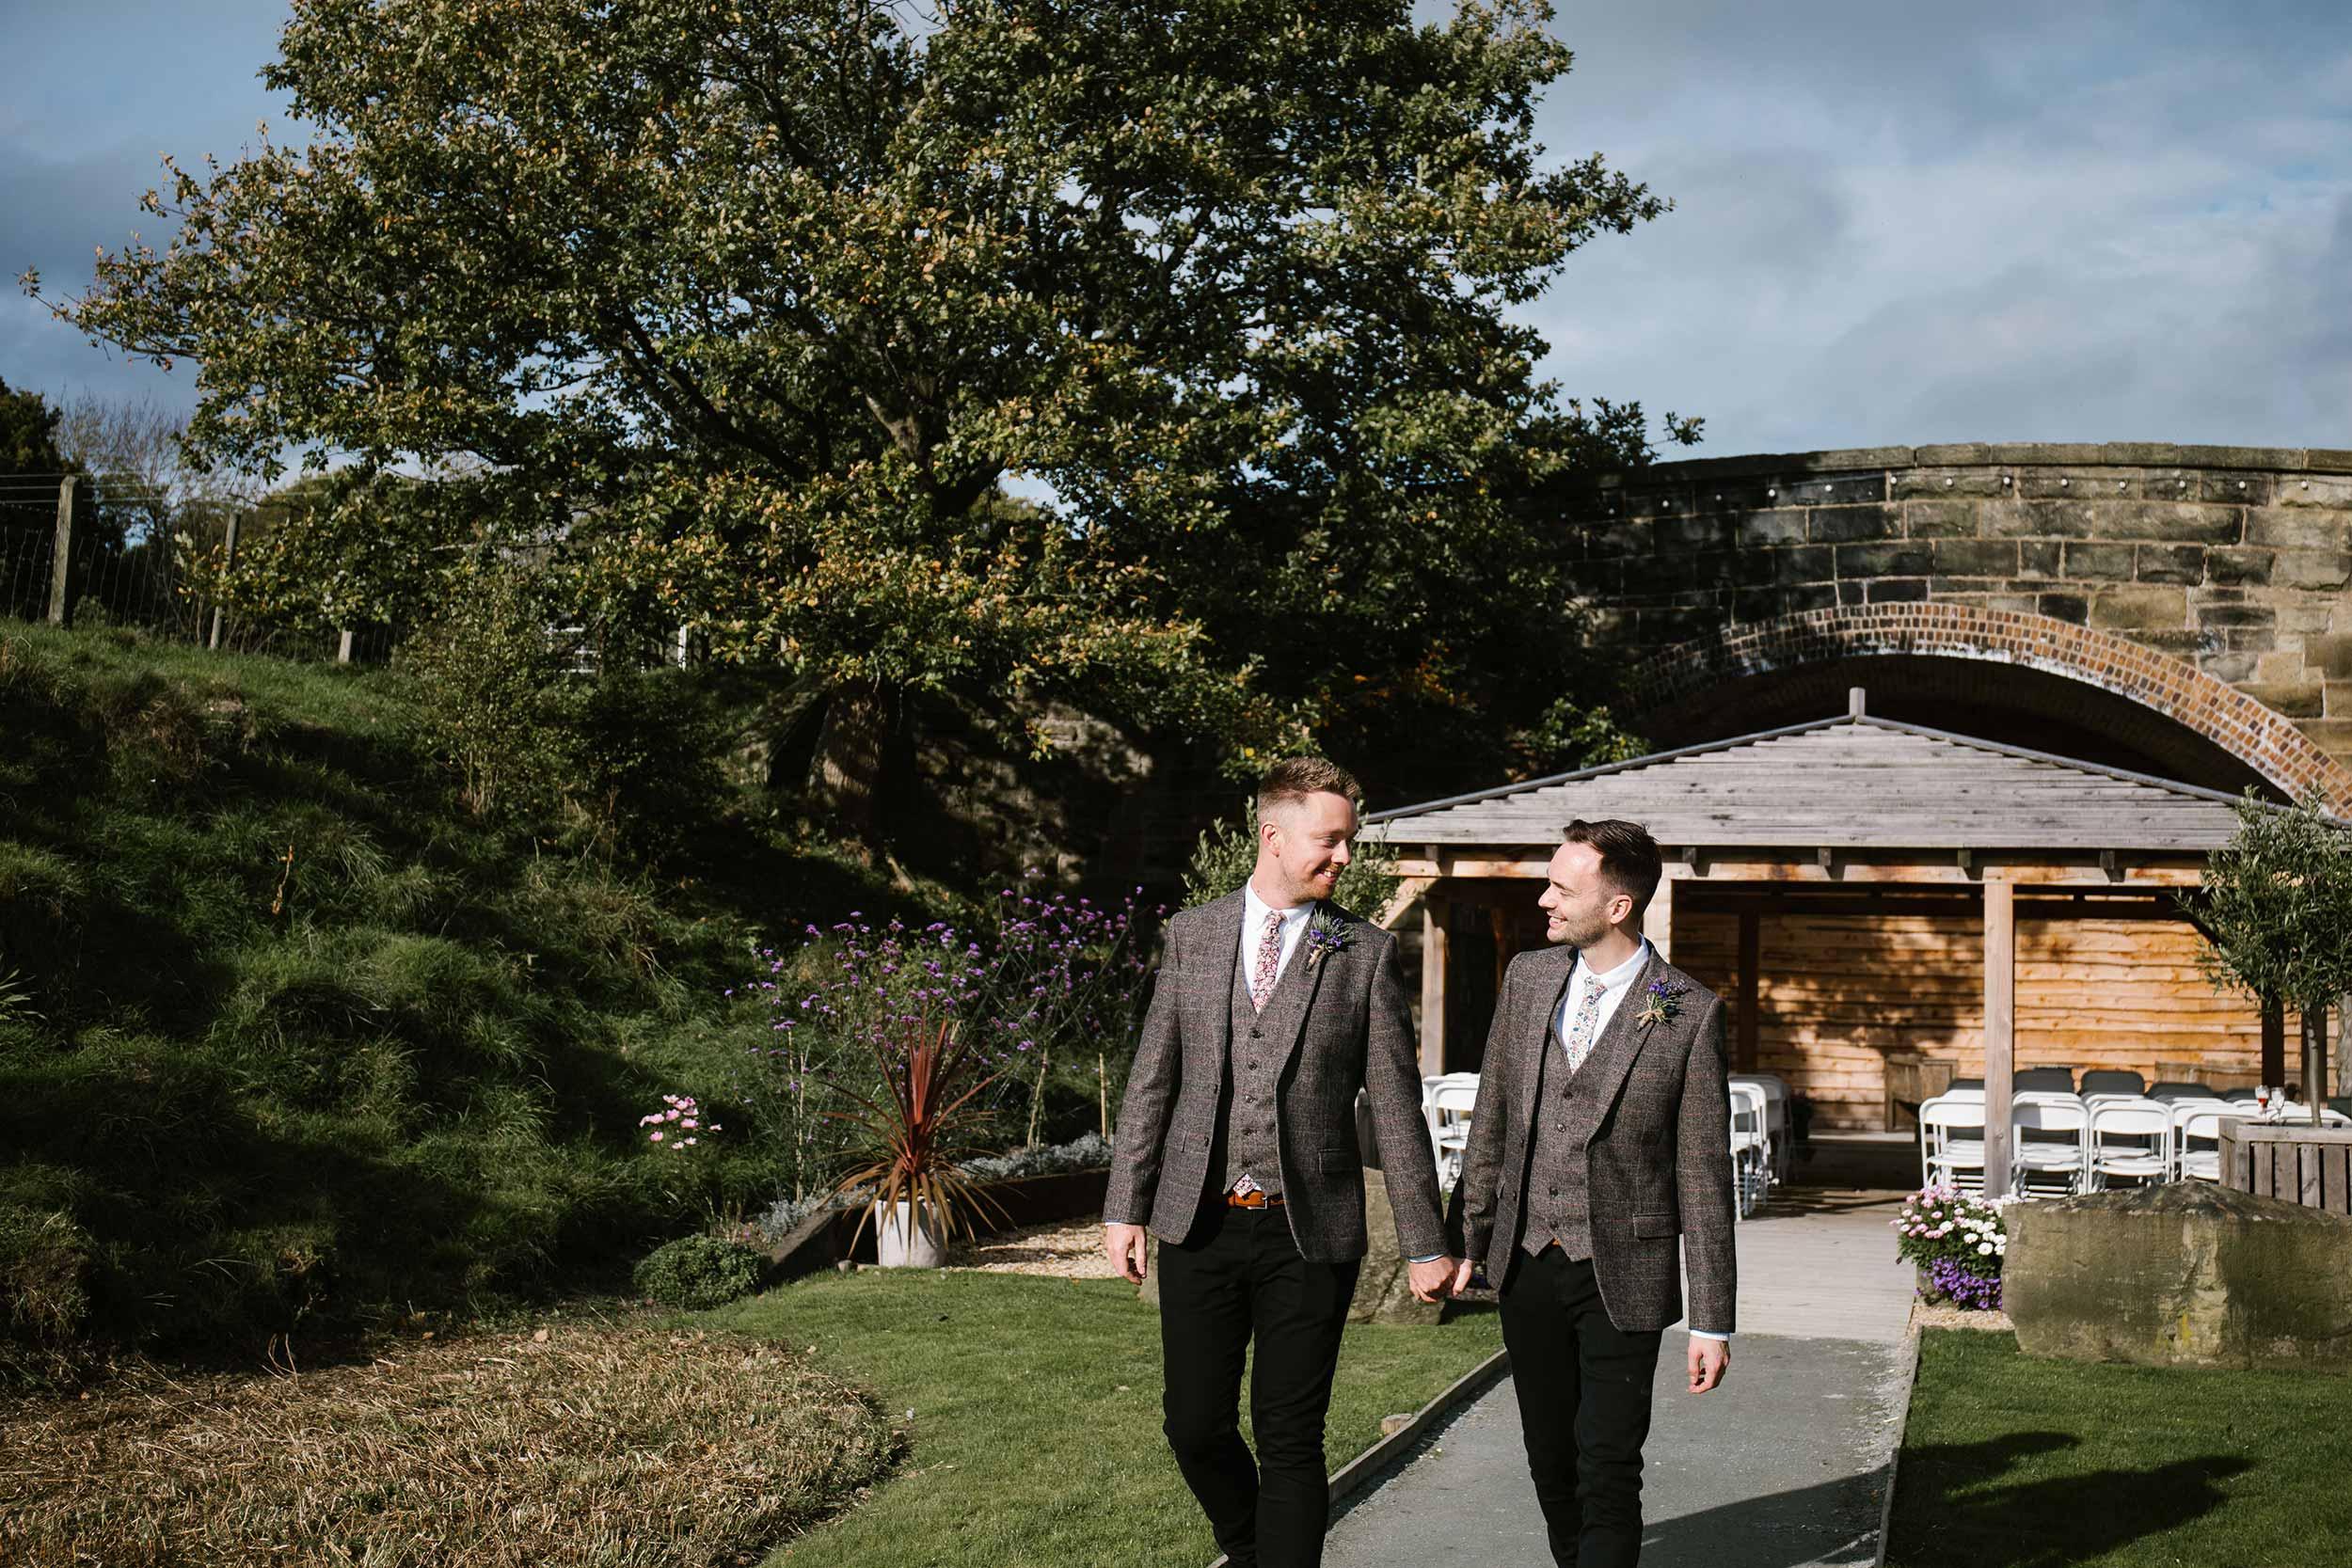 Tower Hill Barns is an LGBTQ+ friendly wedding venue